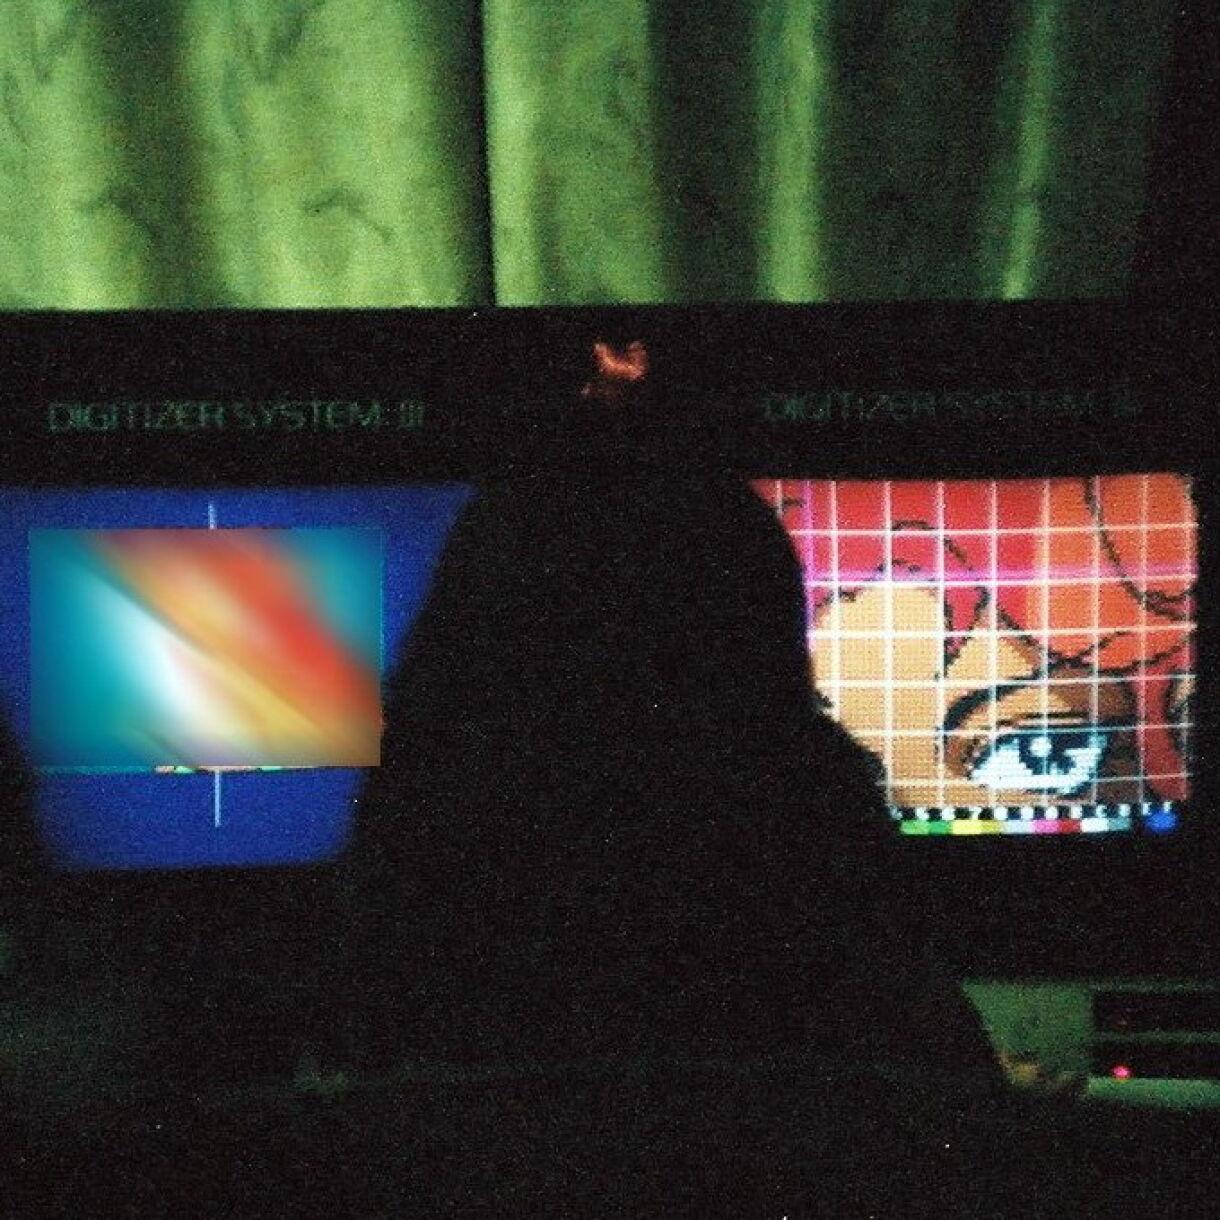 Sega Digitizer System: Old Game Art Tools